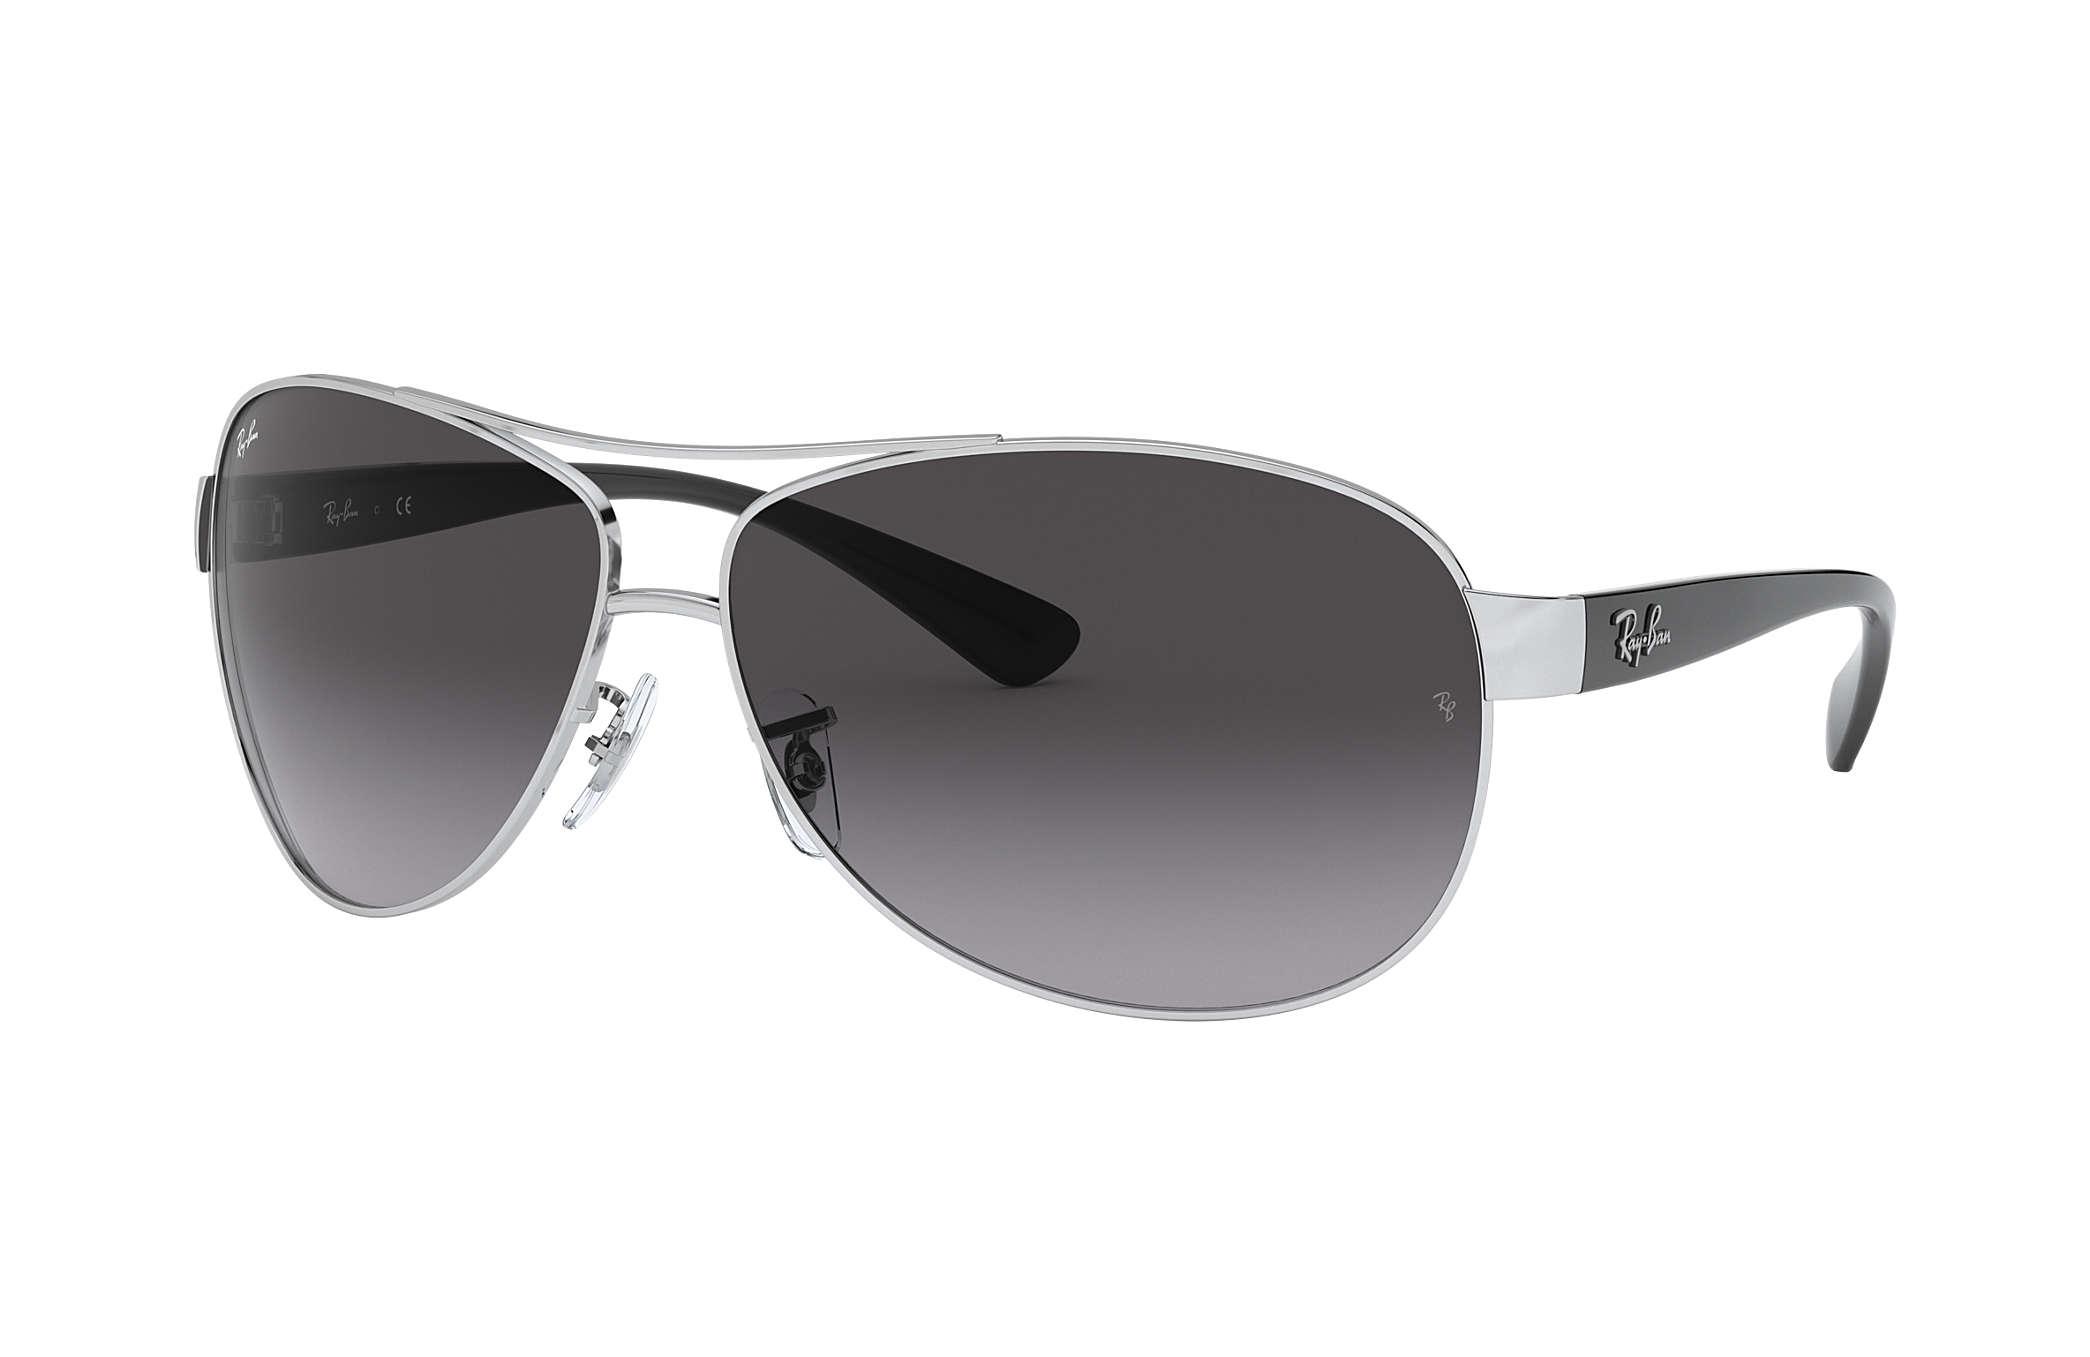 42420fcf76 Ray-Ban RB3386 Silver - Metal - Grey Lenses - 0RB3386003/8G63 | Ray ...